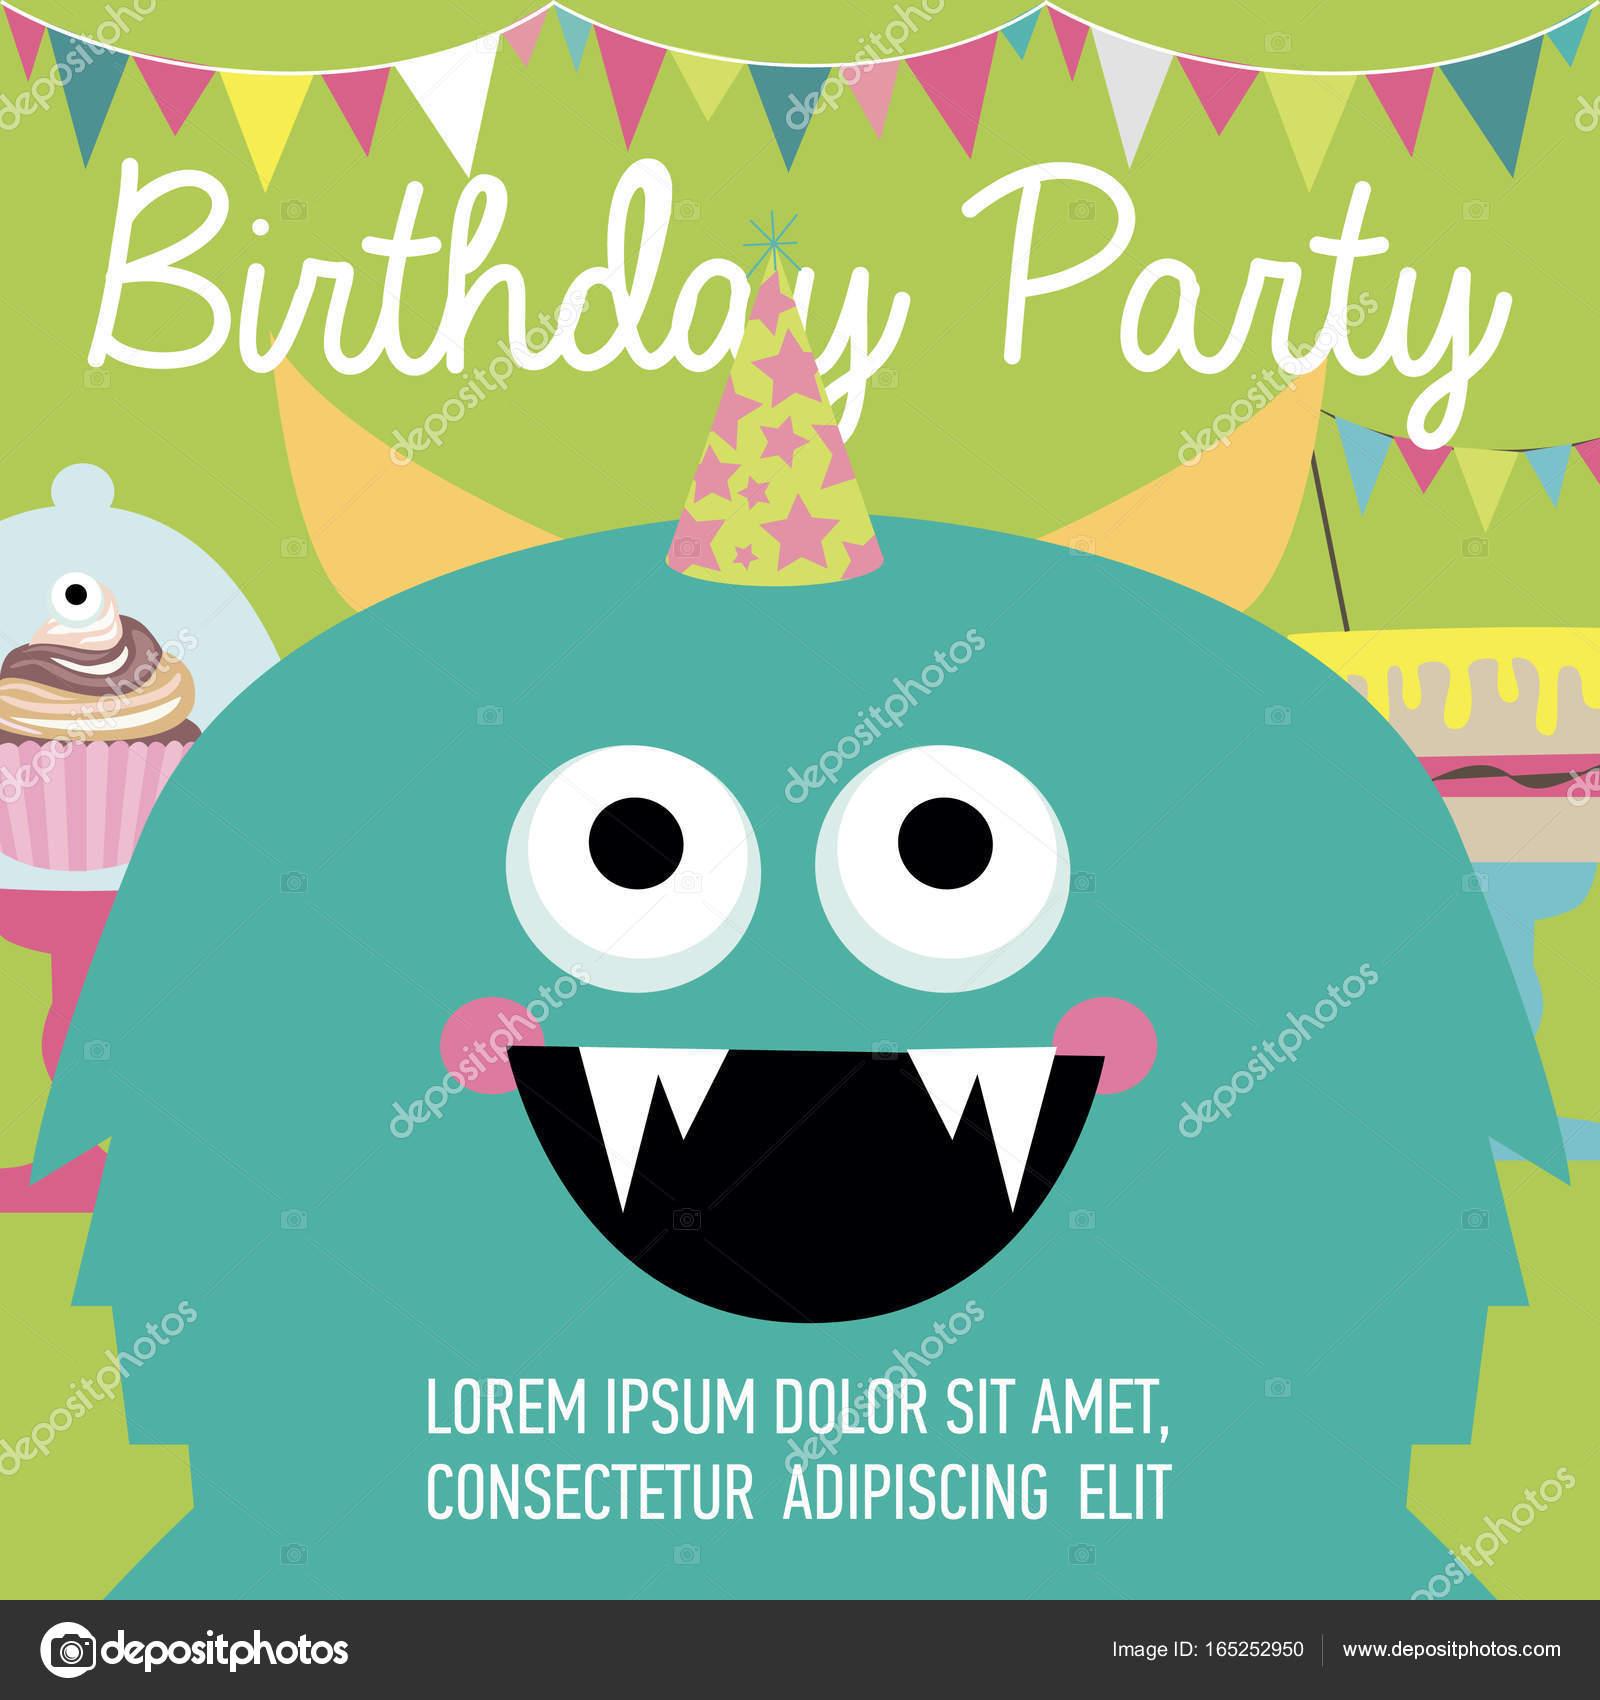 Monster birthday party invitation card vetor de stock vissay monster birthday party invitation card vetor de stock stopboris Gallery